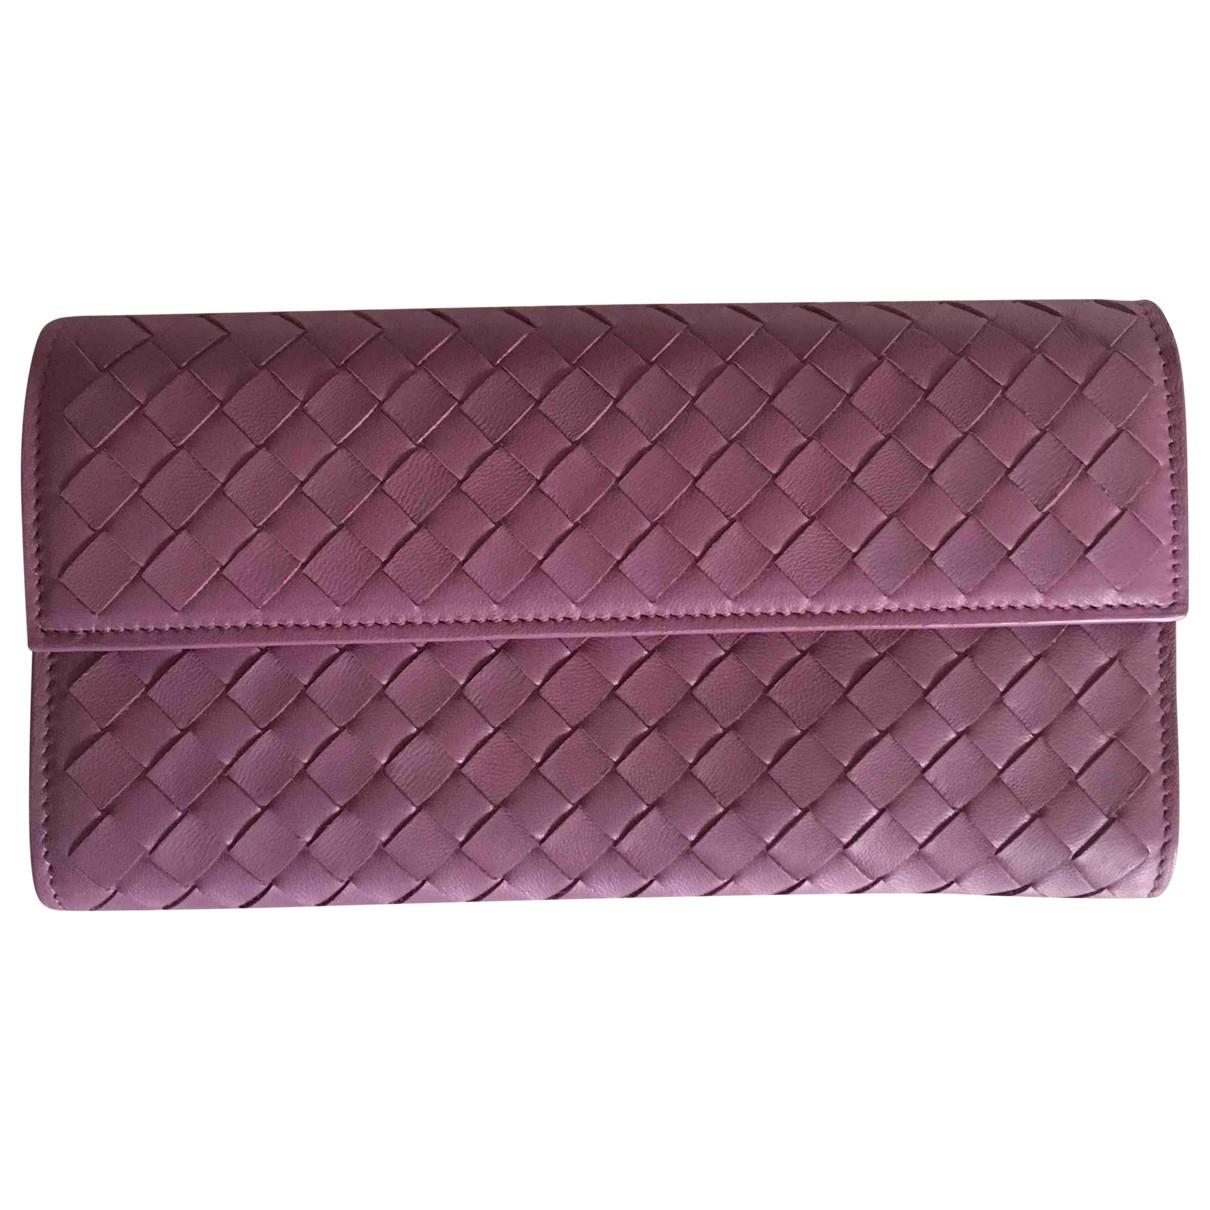 Bottega Veneta Intrecciato Purple Leather wallet for Women \N